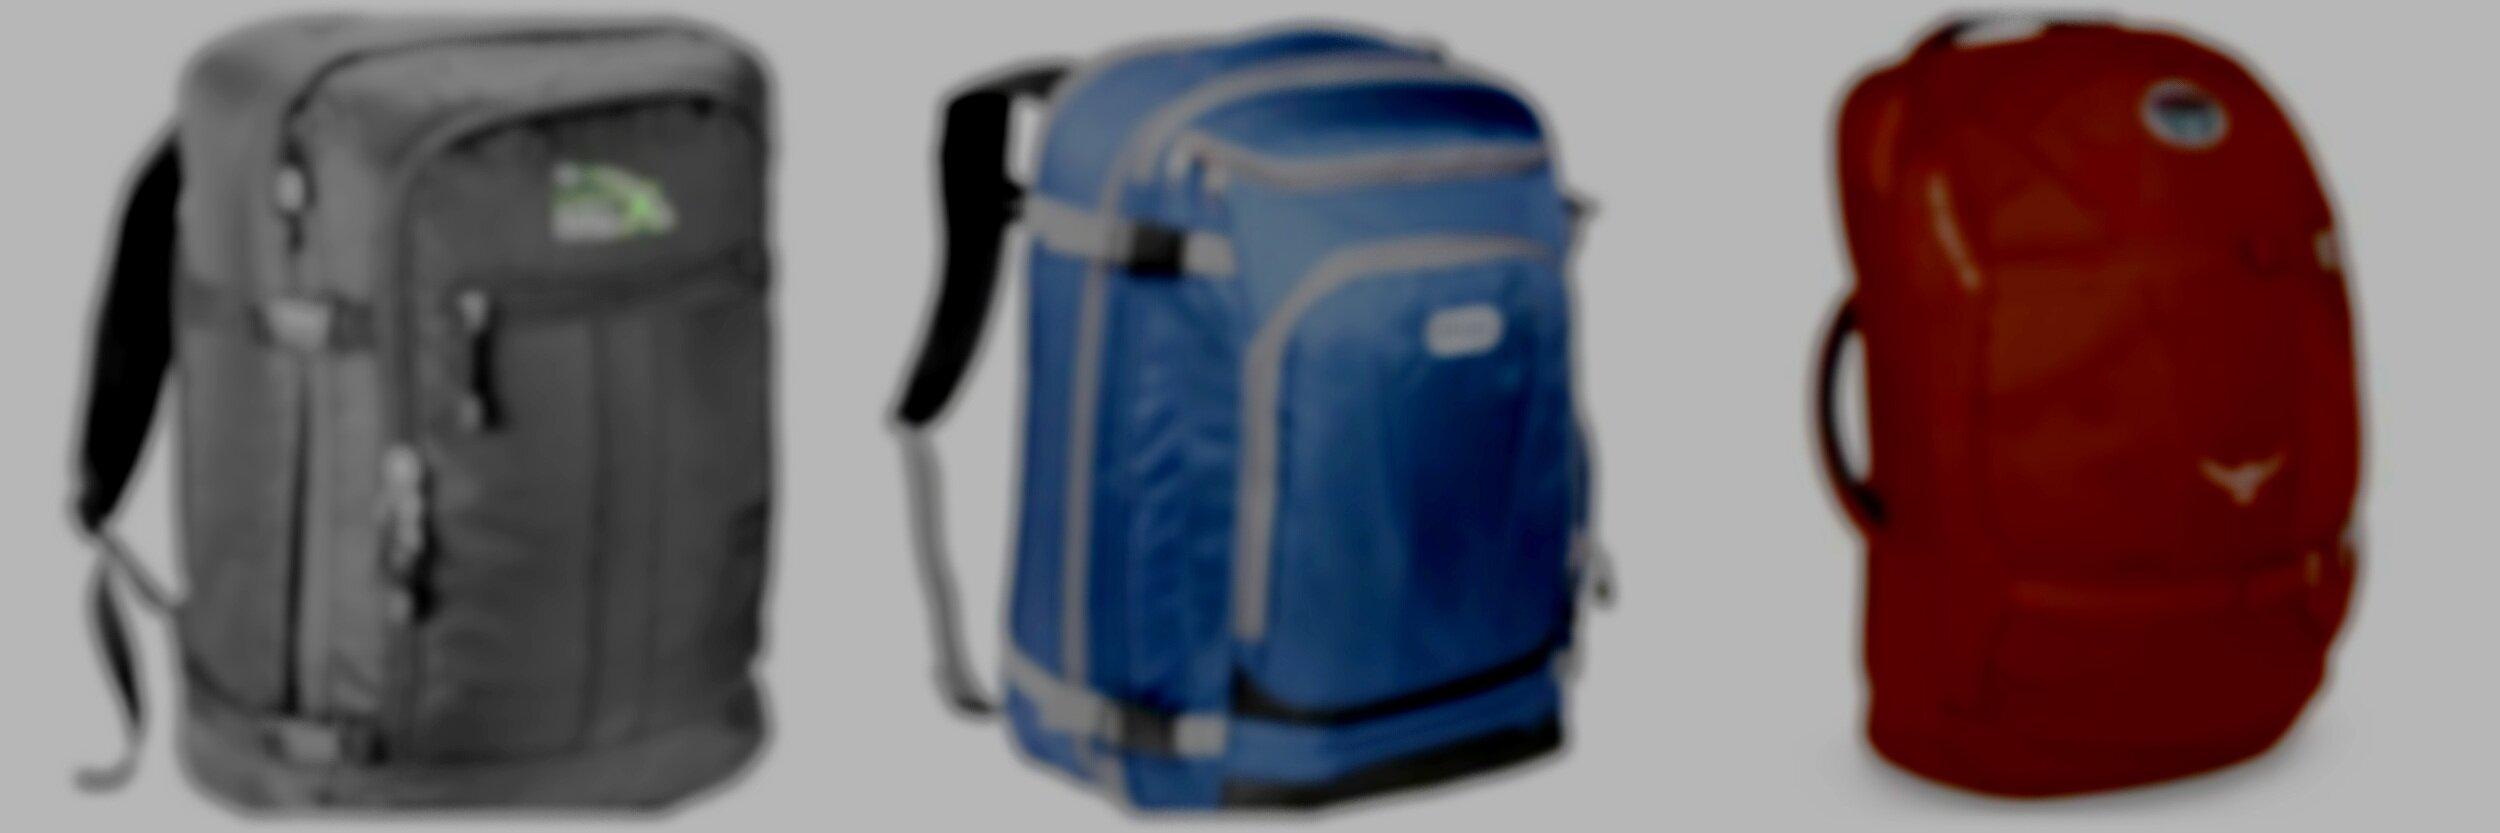 Best Backpacks For Traveling vr9AB1wW